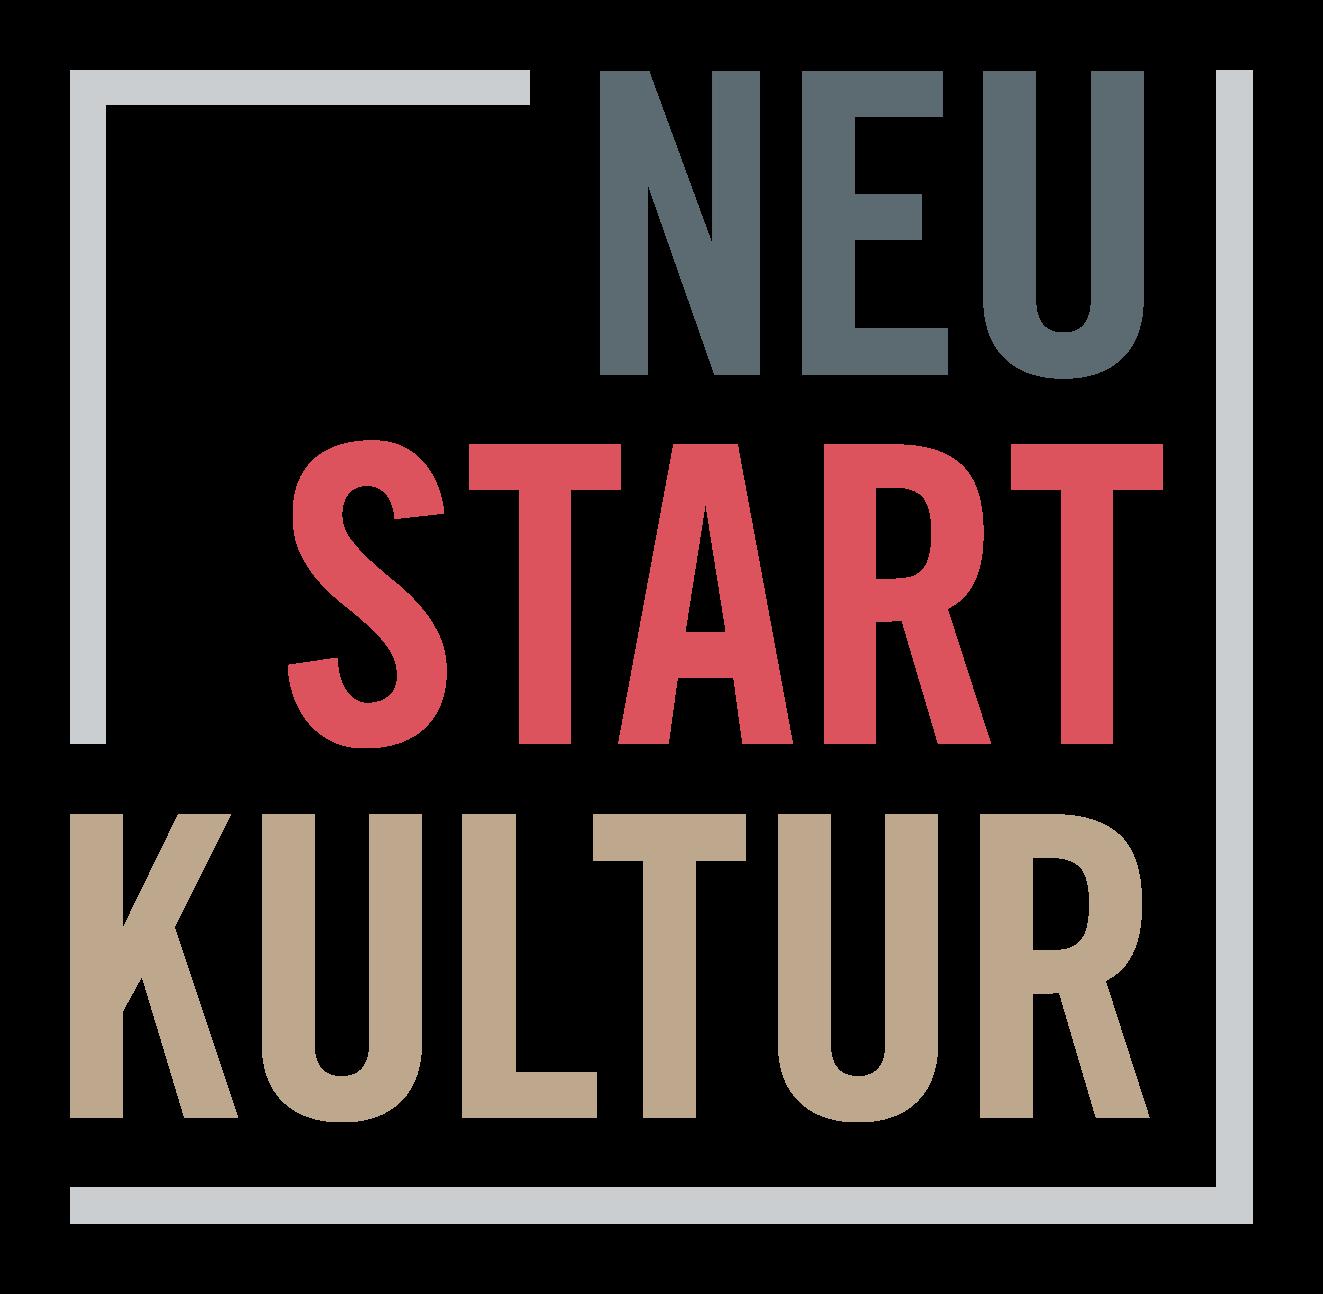 bkm_neustart_kultur_wortmarke_neg_cmyk_rz